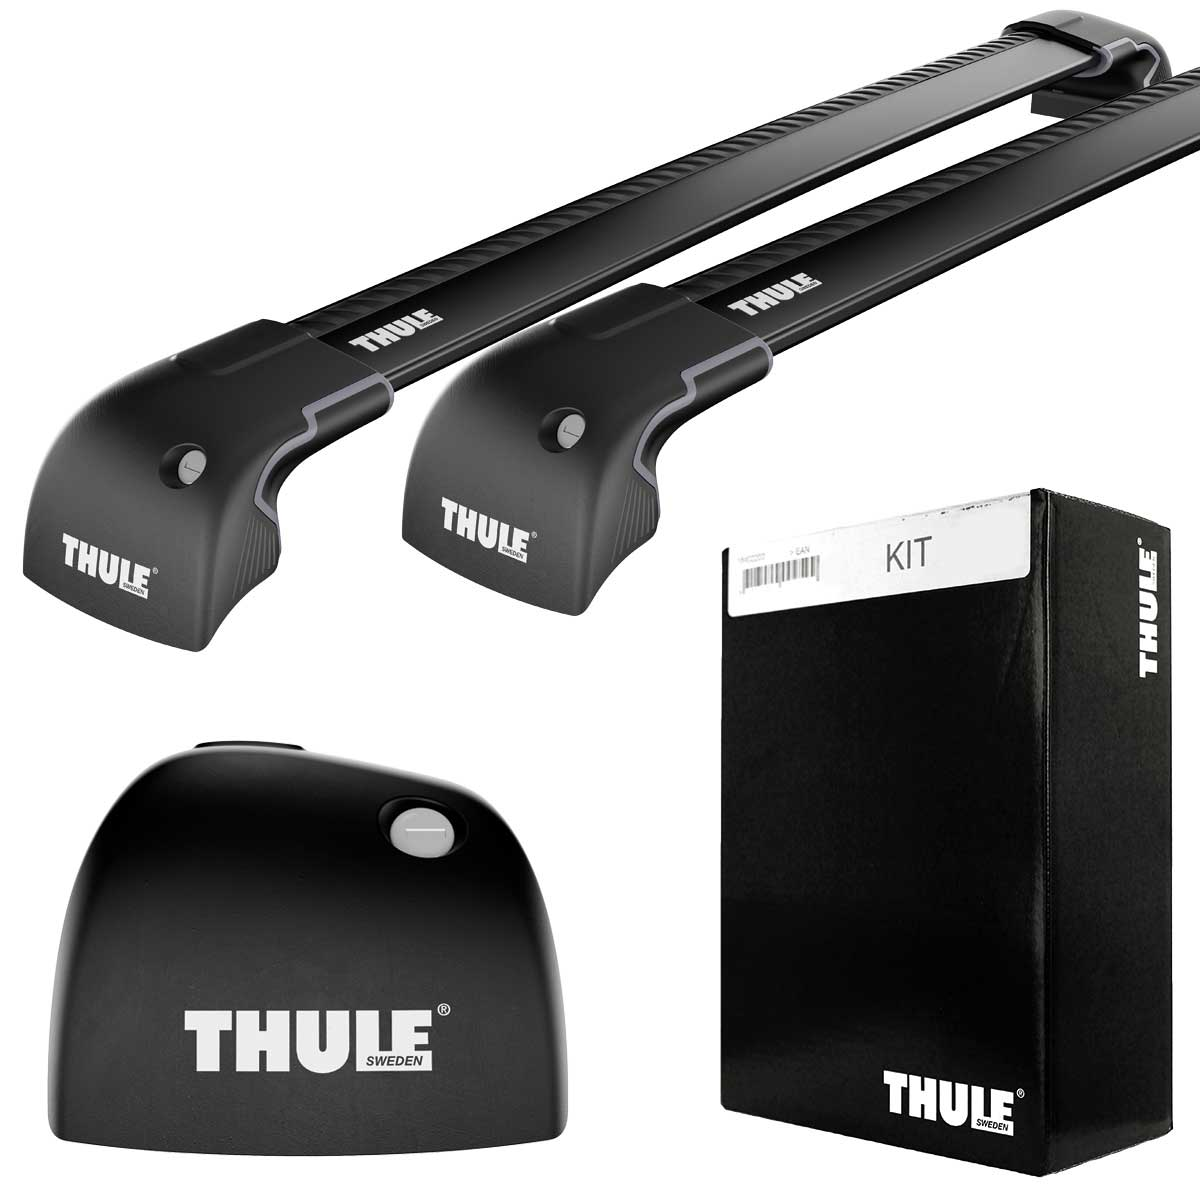 mercedes thule wingbar edge black 9594 kit 4068. Black Bedroom Furniture Sets. Home Design Ideas